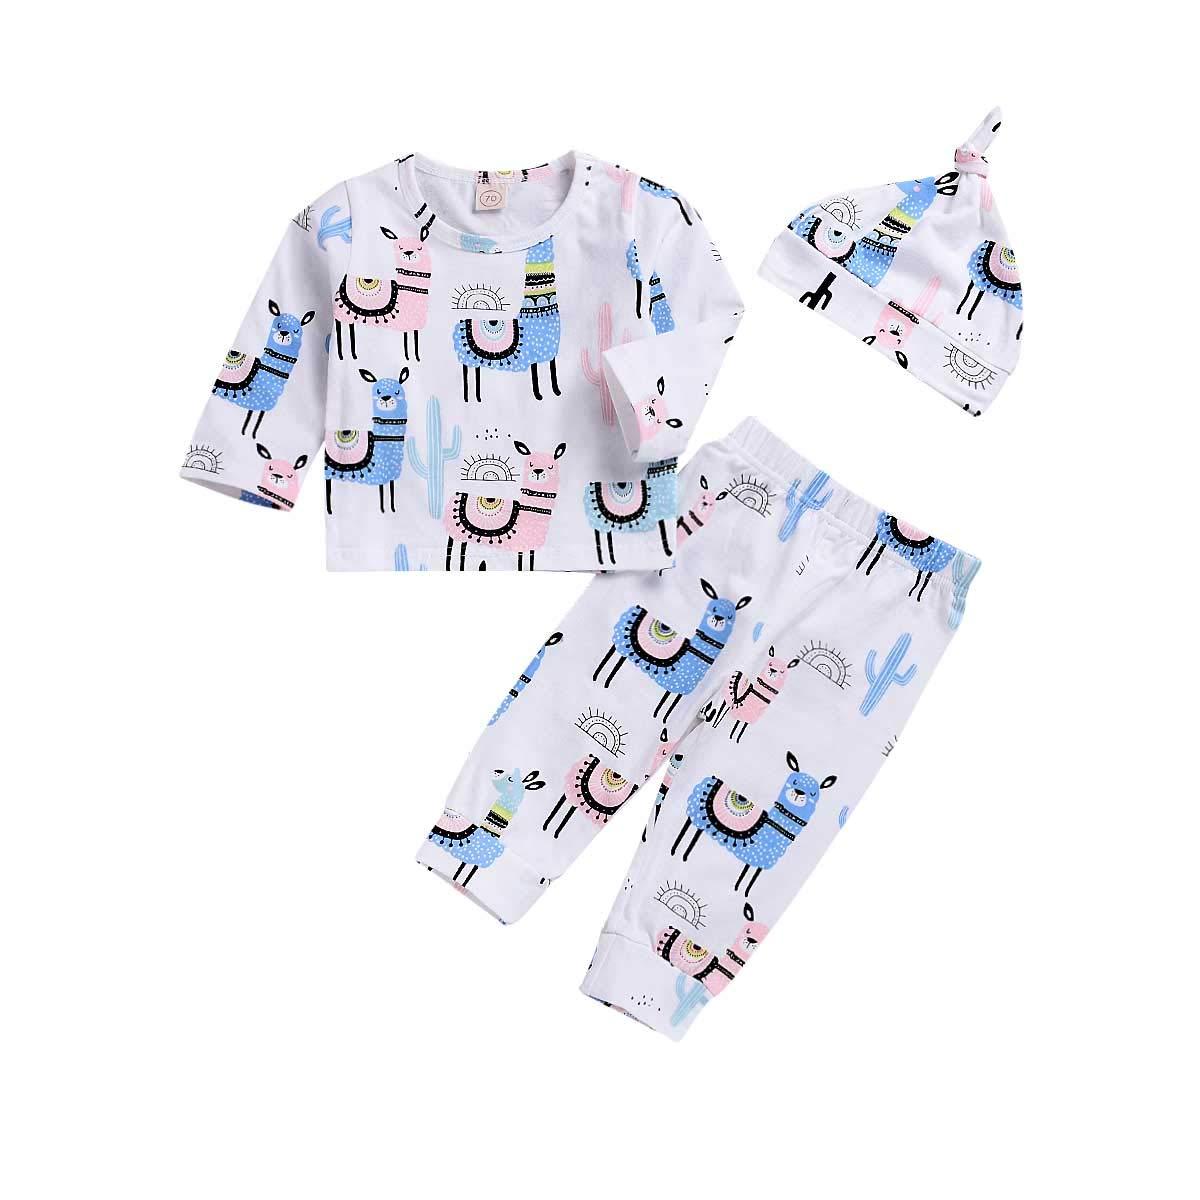 88c589f0f05 Amazon.com  Baby Girls Boys Clothes Newborn Baby Girl Boy Animal Print  Romper Infant Alpaca Bodysuit Cactus Jumpsuit Long Sleeve Outfit  Clothing